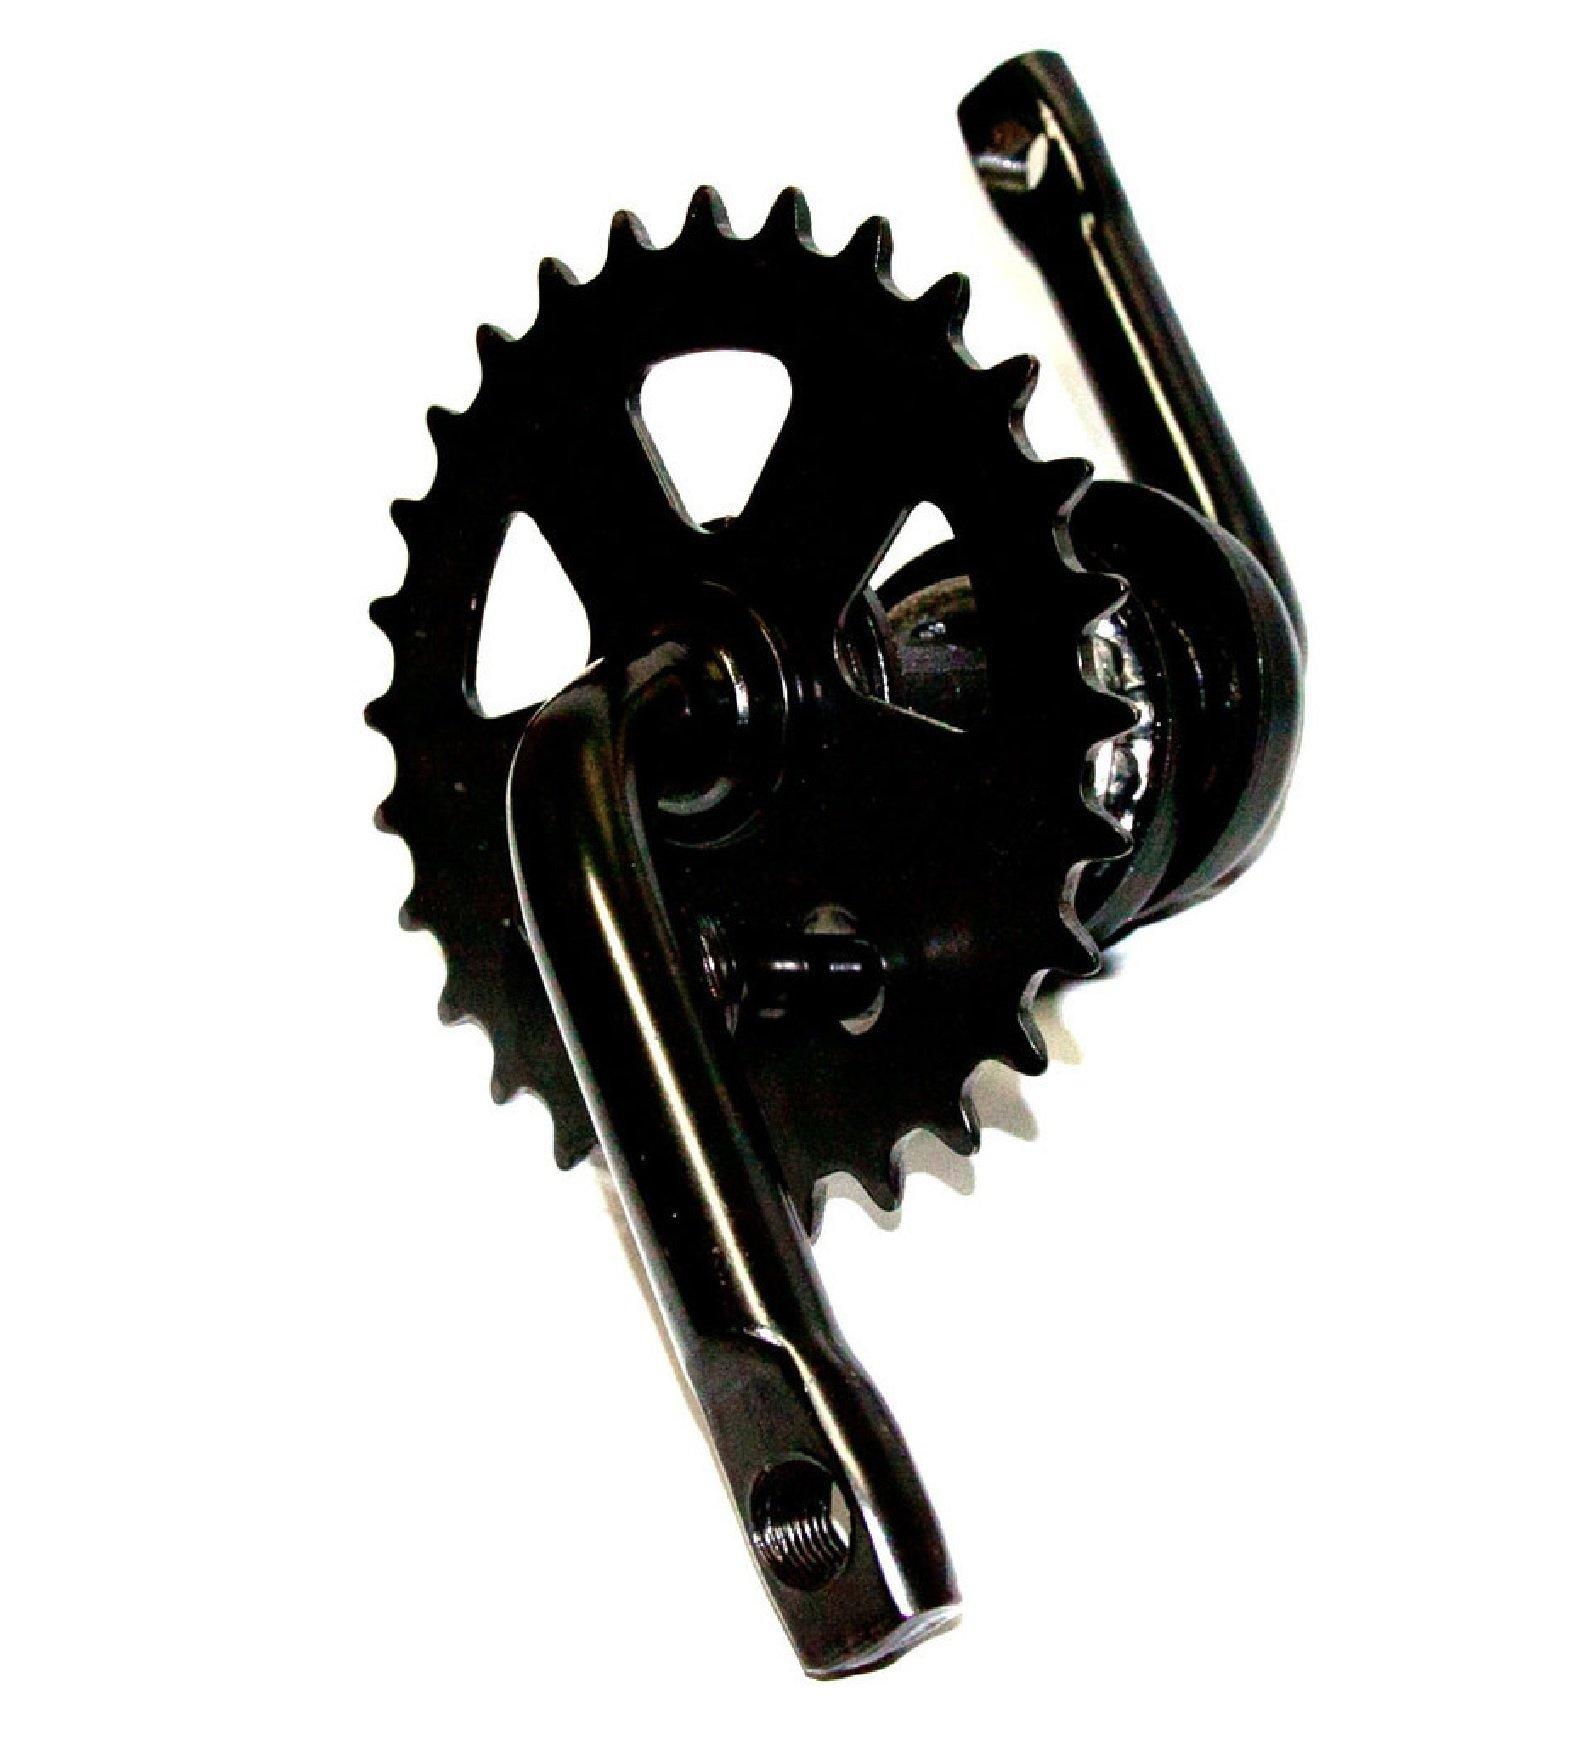 Fatboy Mini BMX 1-piece Crank (Black)